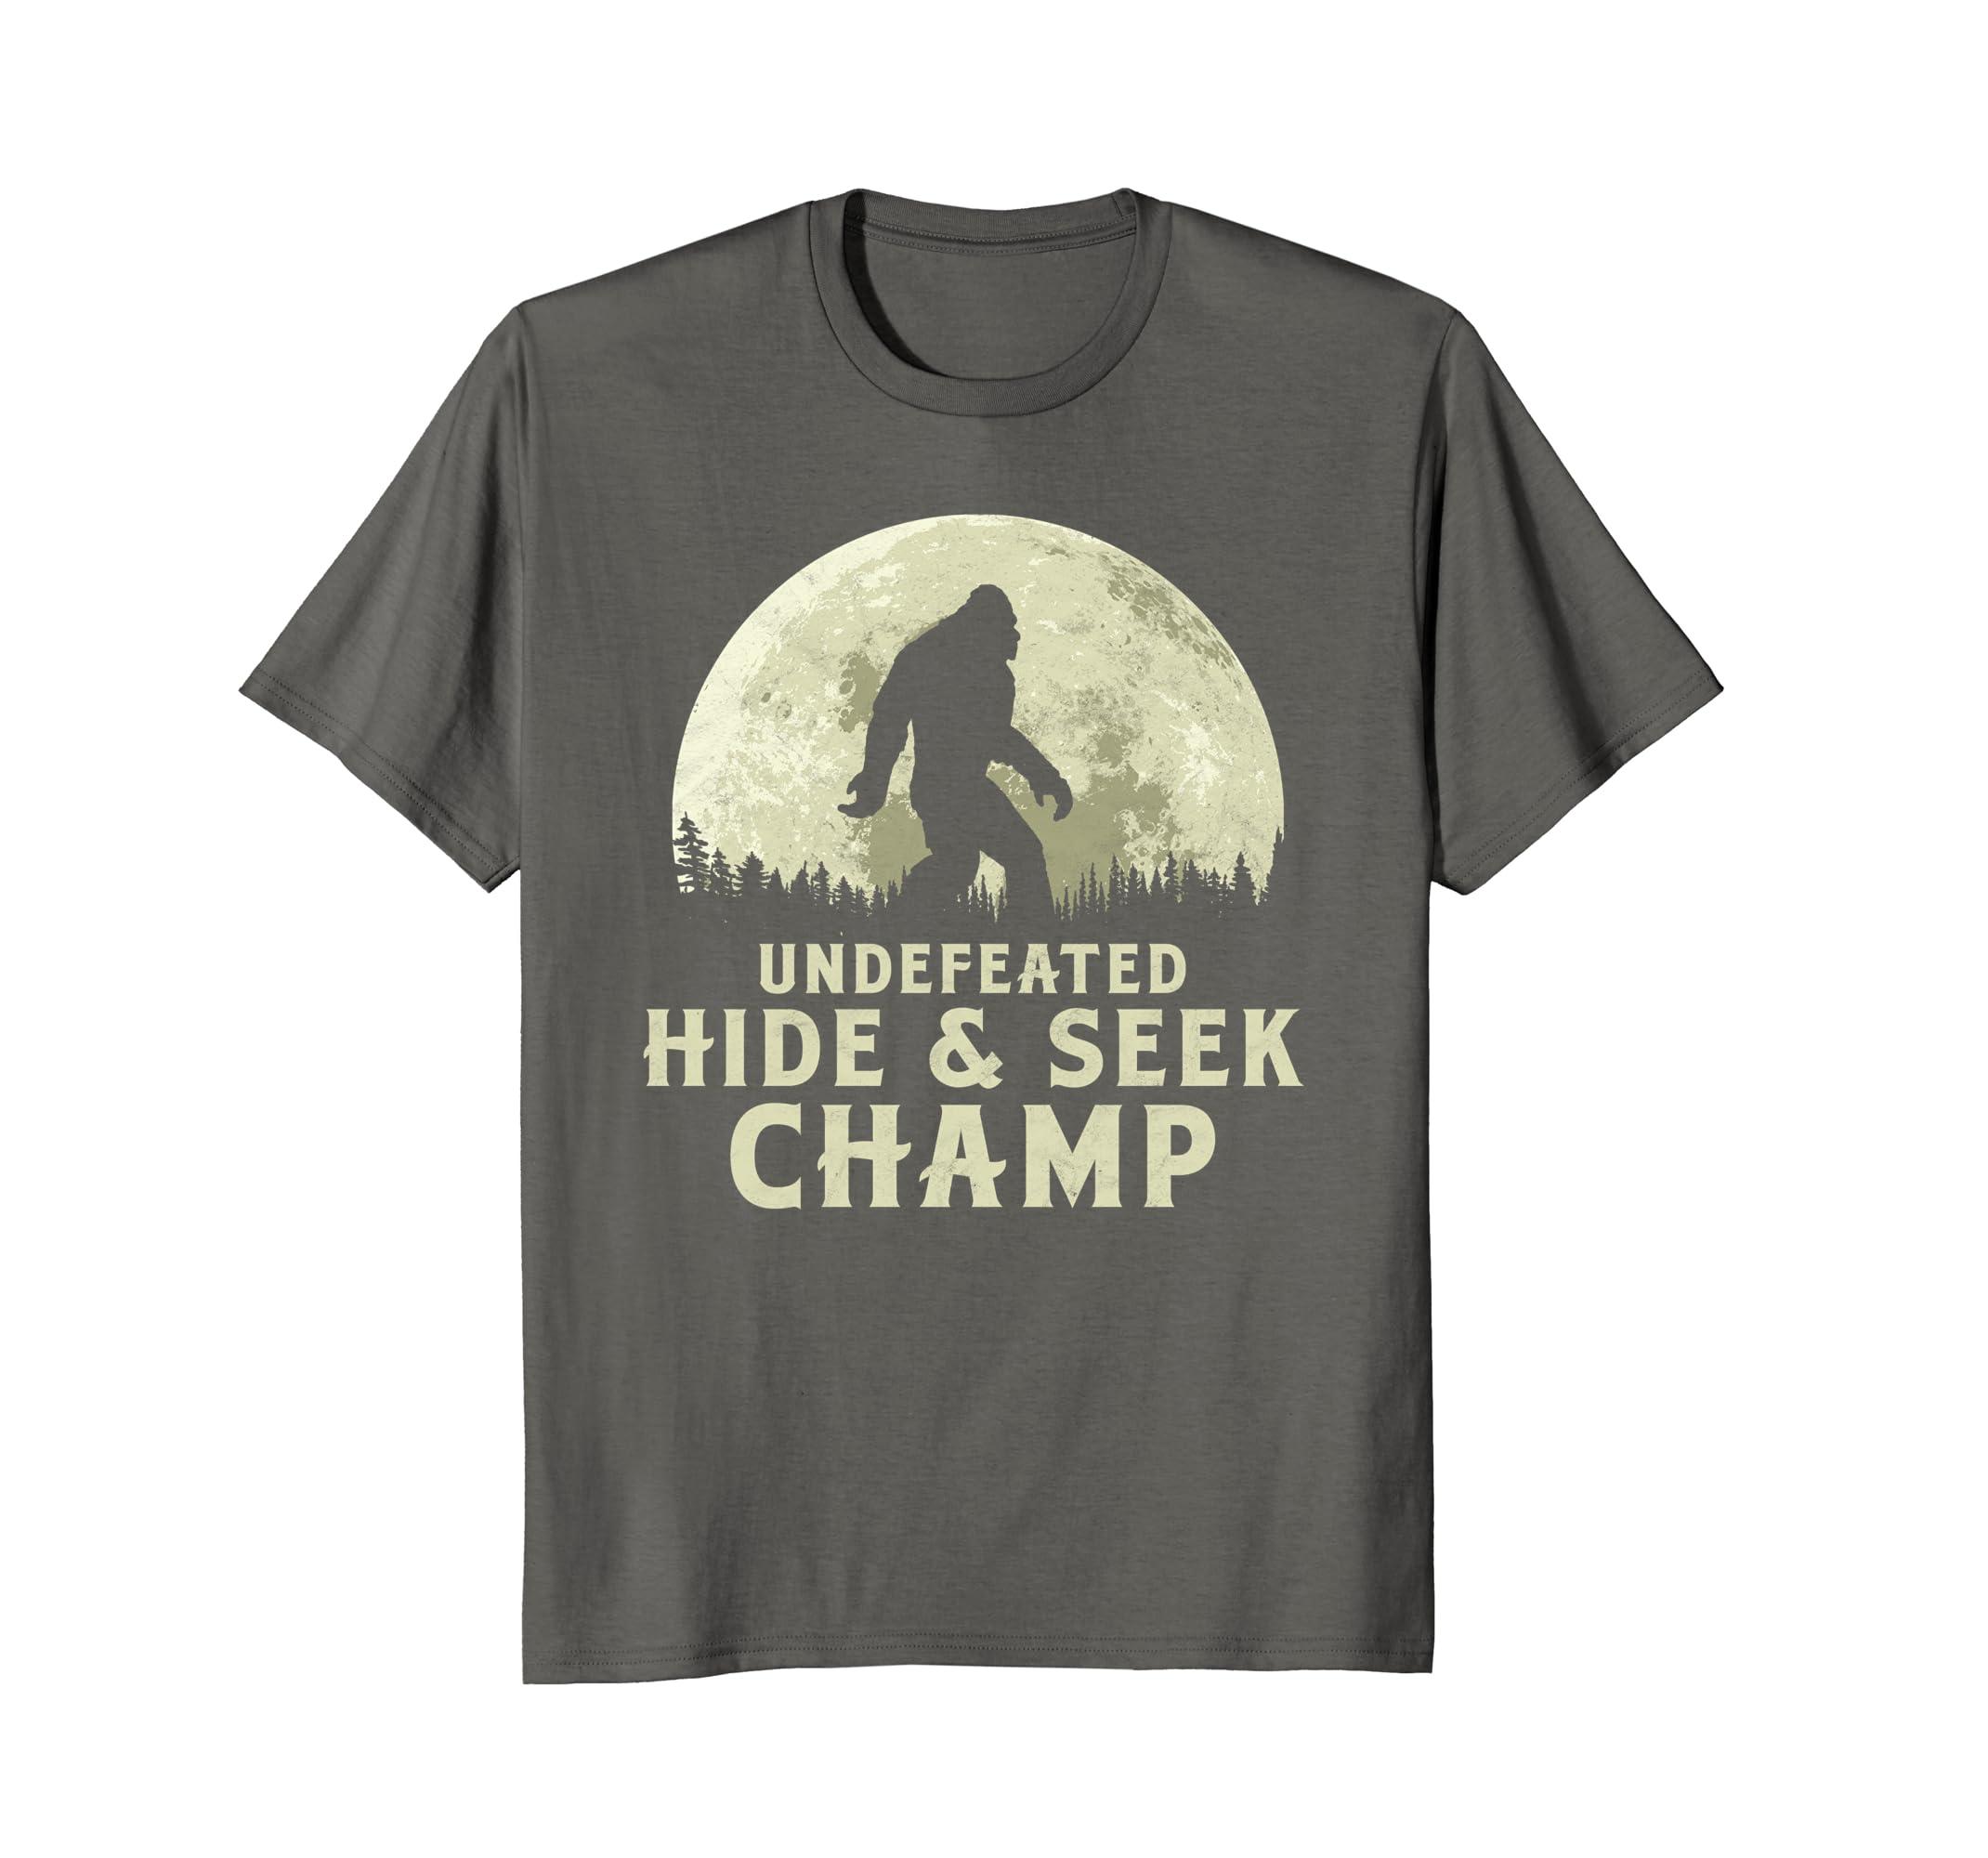 2dc5aea7 Amazon.com: Undefeated Hide & Seek Champ Bigfoot Moon T-Shirt - Believe!:  Clothing